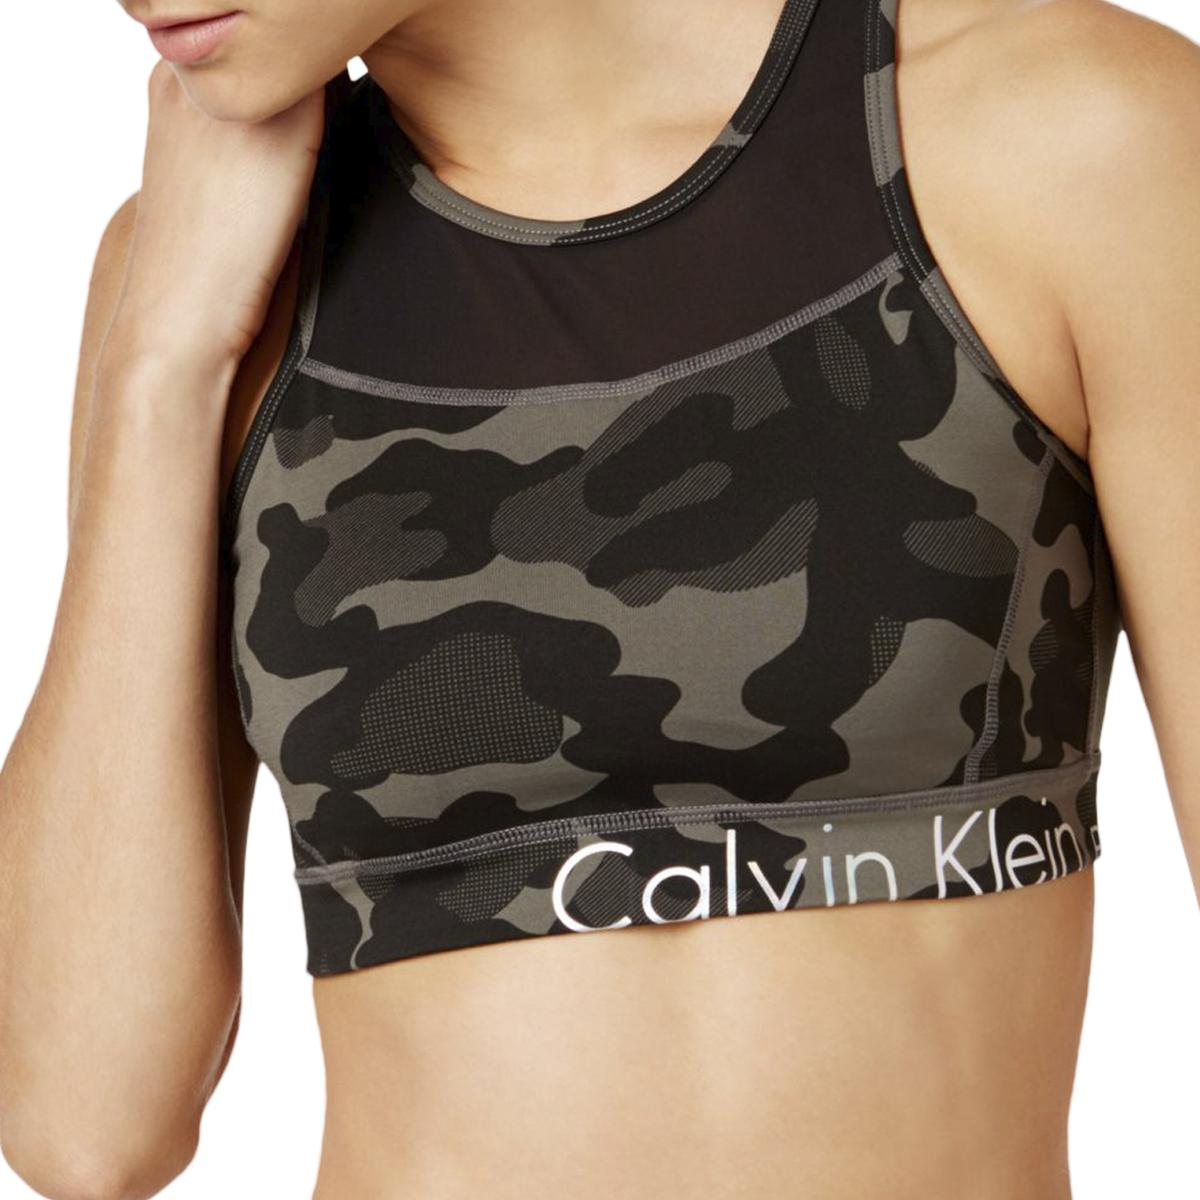 1de632229c7b Details about Calvin Klein Performance Womens Jigsaw Print Sports Bra  Athletic BHFO 6294